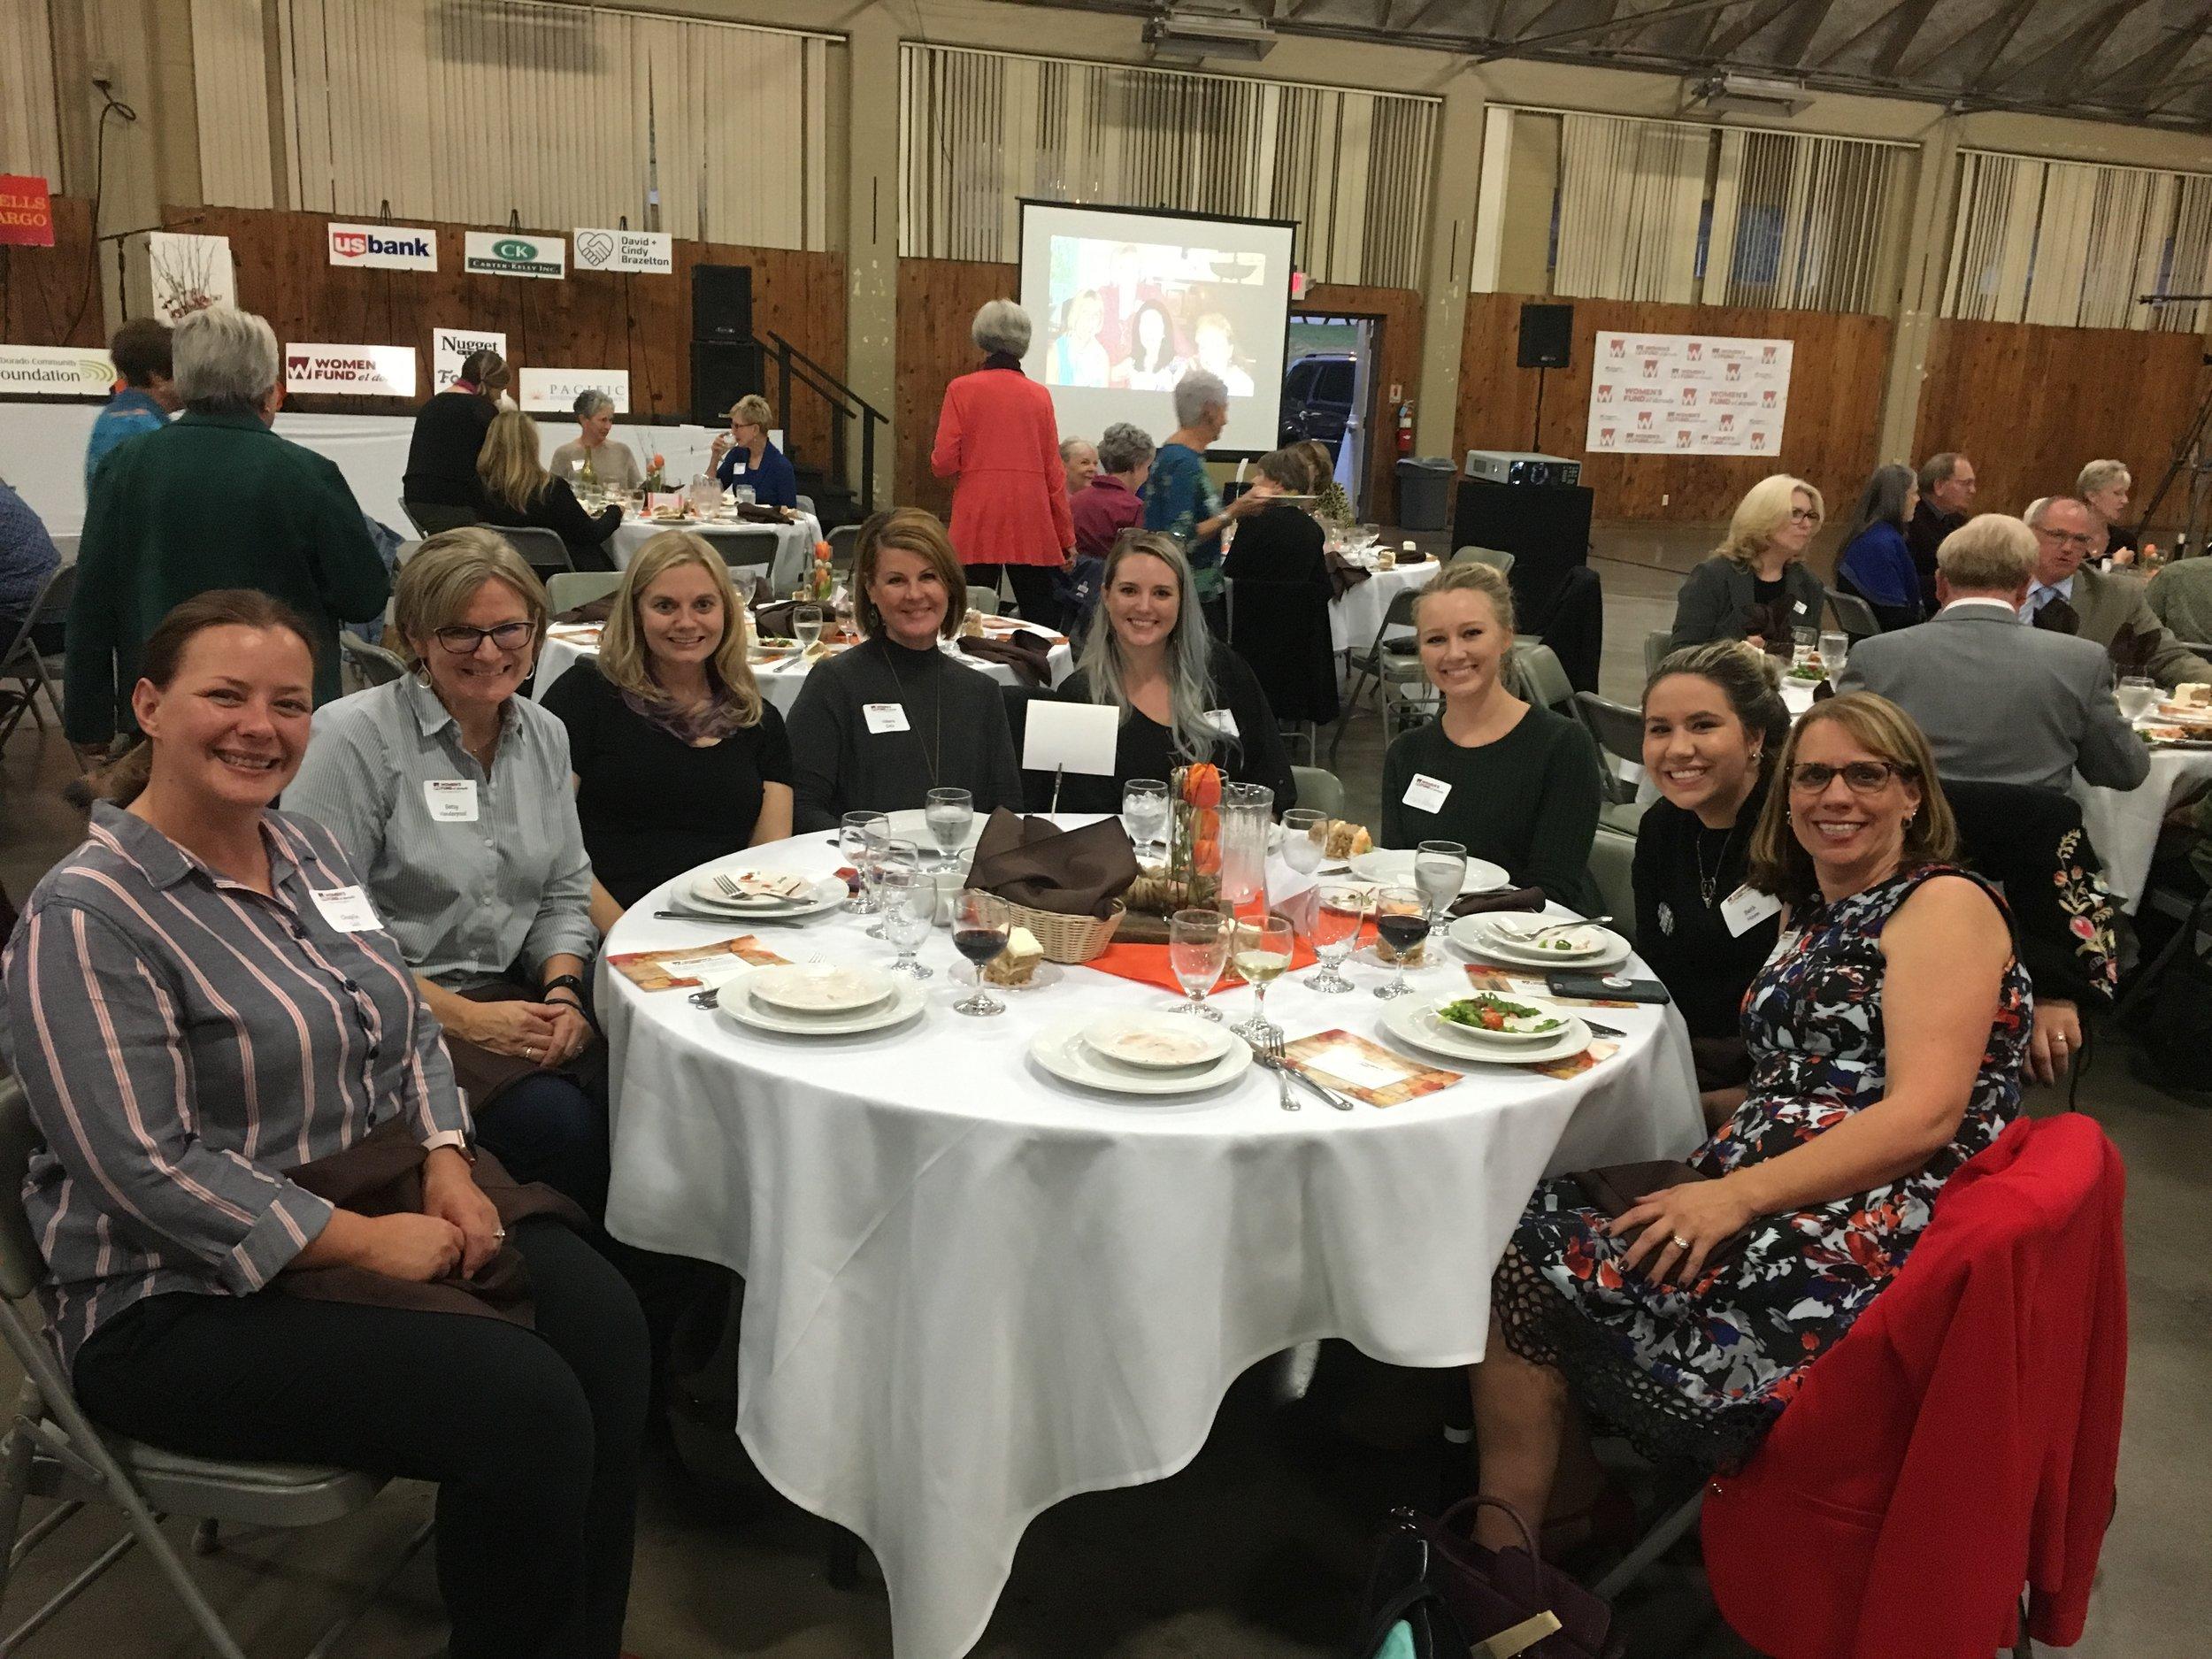 IMG 6_ Lois Stowe , Betsy Vanderpool, Heather Cook, Valerie Soto, Alicia Moorecraft, Grace Wonder, Beth Horn, Patricia Horn.JPG